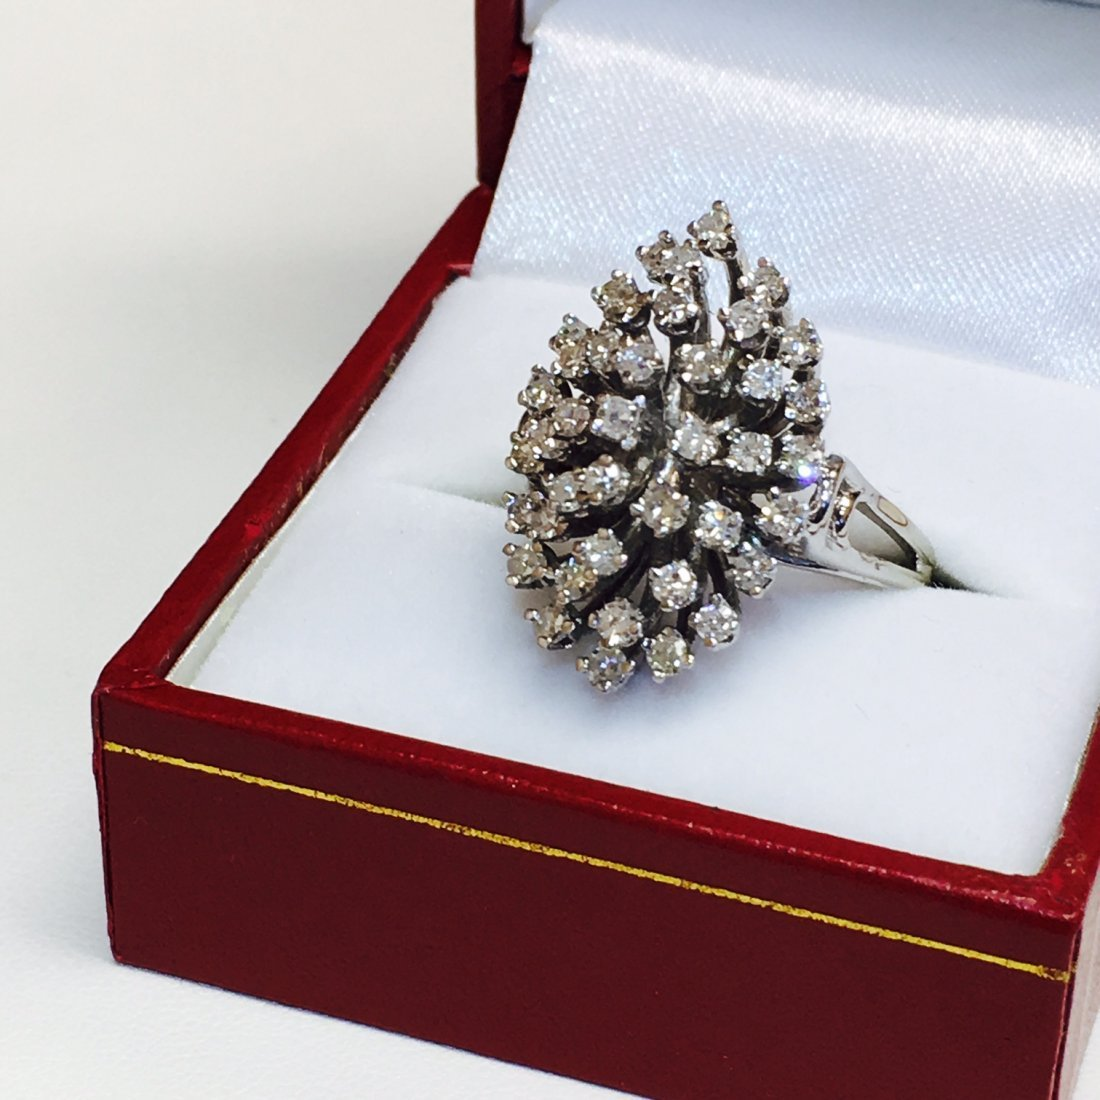 14k Gold & White Diamond Cocktail Ring - 3